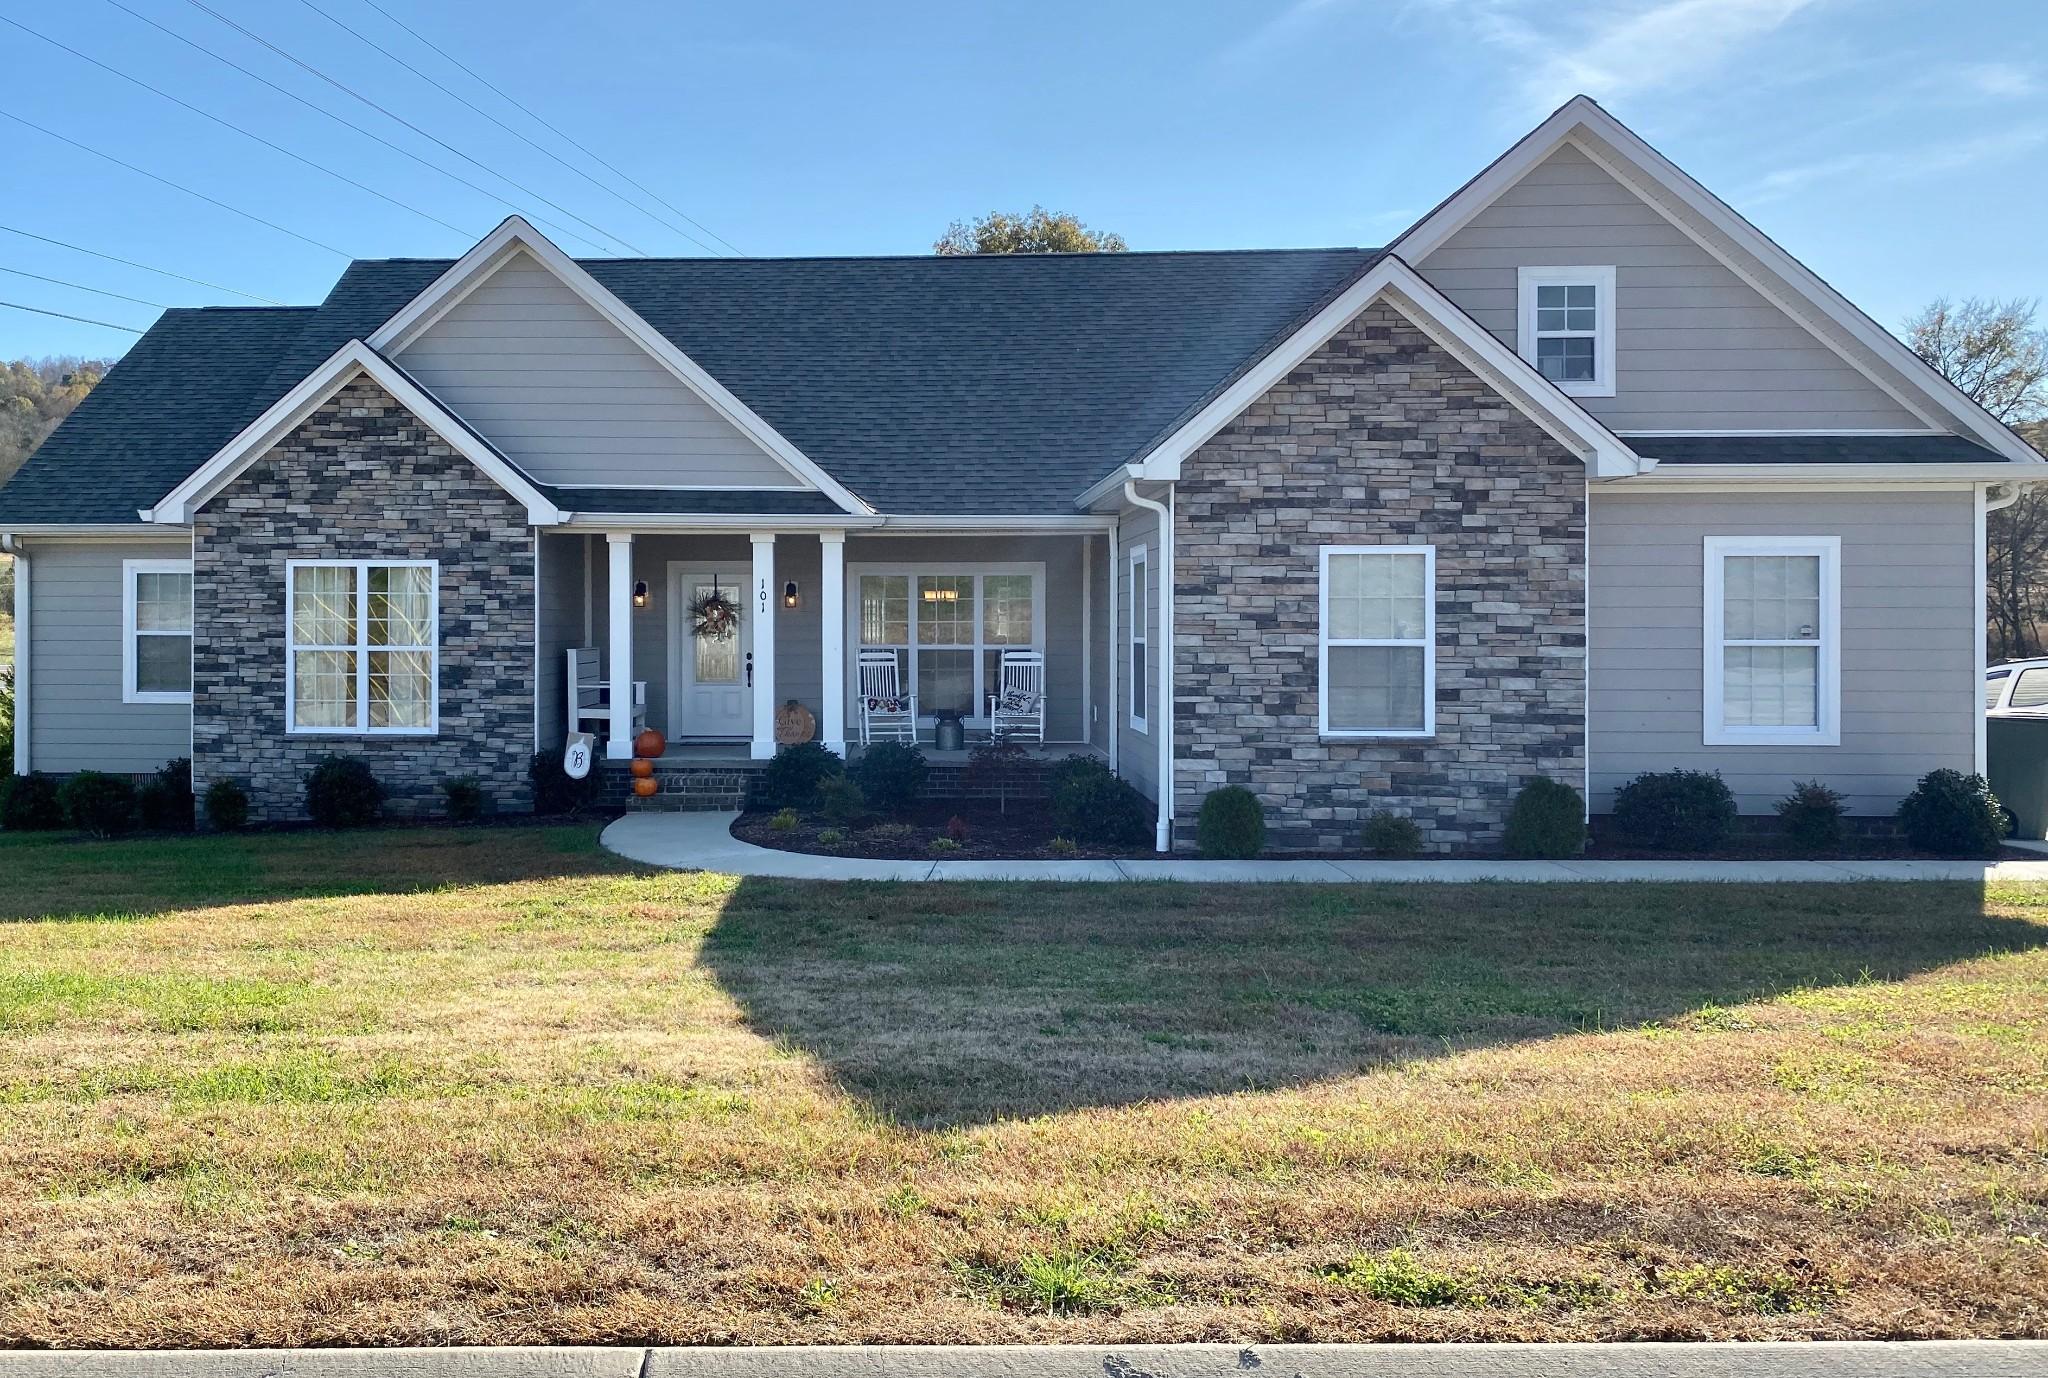 101 Casey St, Brush Creek, TN 38547 - Brush Creek, TN real estate listing